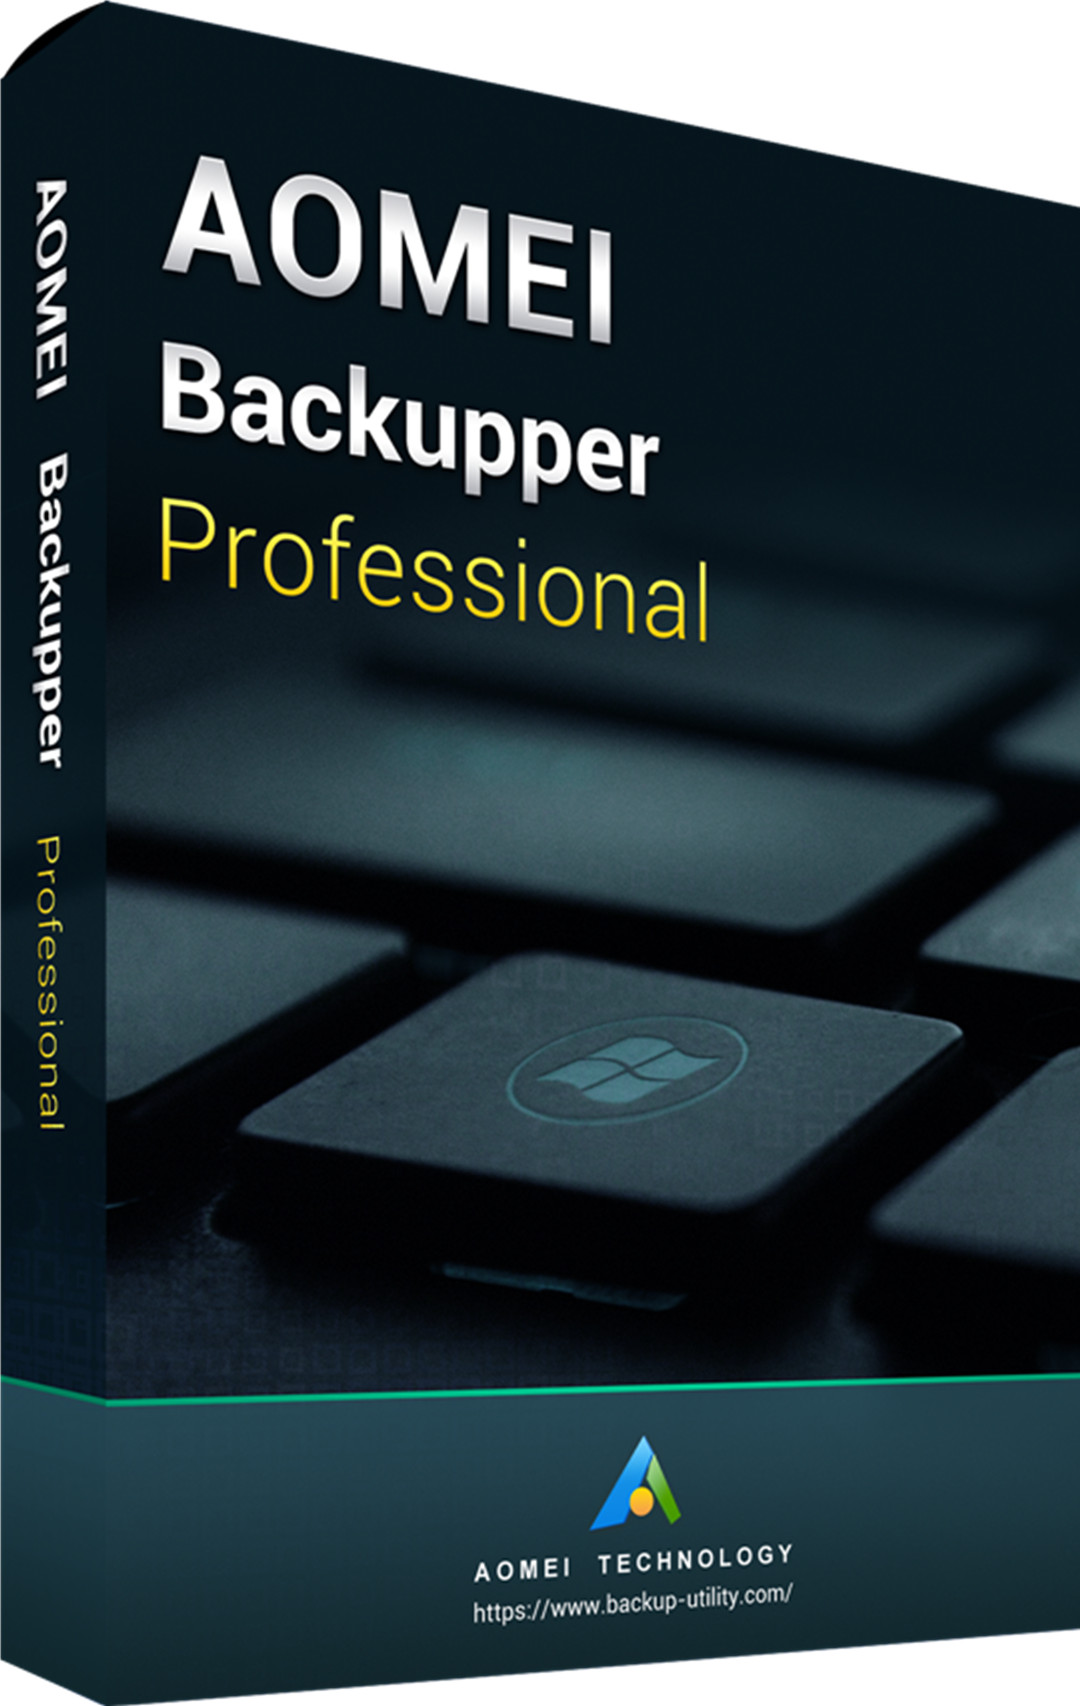 AOMEI Backupper Professional 365 Days 5.6 Edition Key Global